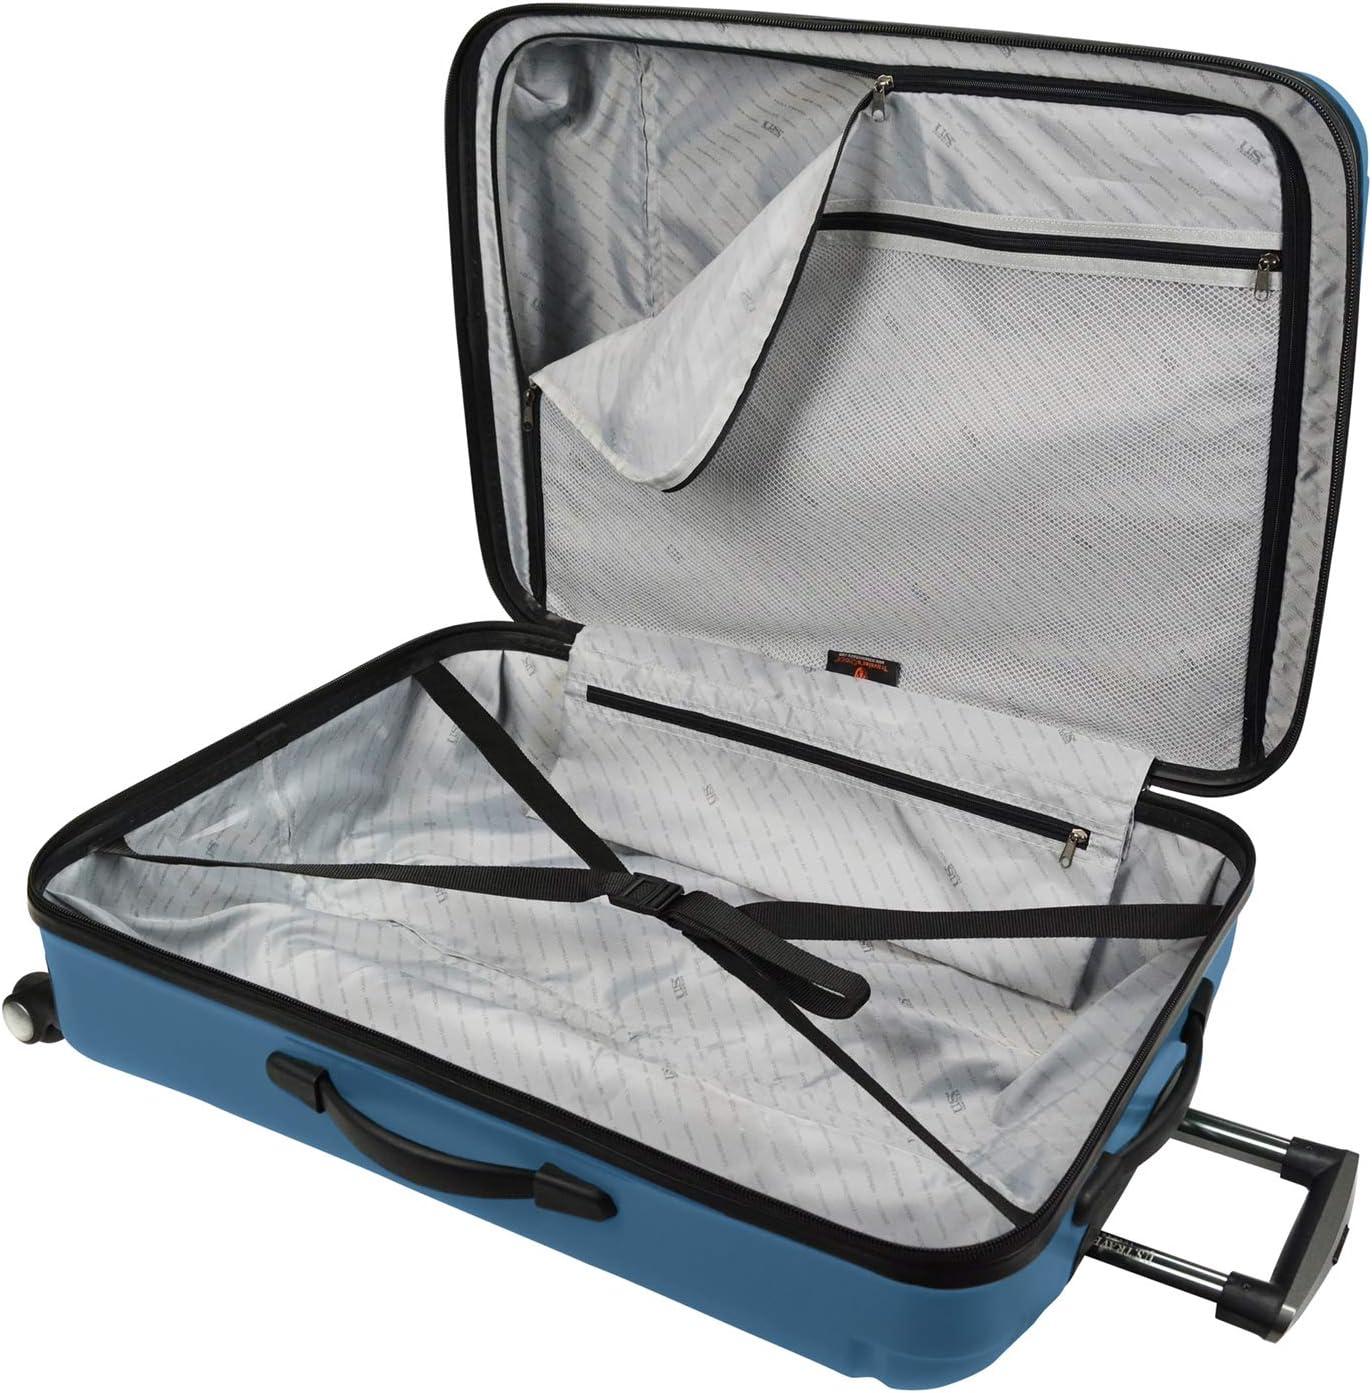 U.S 3-Piece Traveler Hytop Spinner Luggage Set Blue